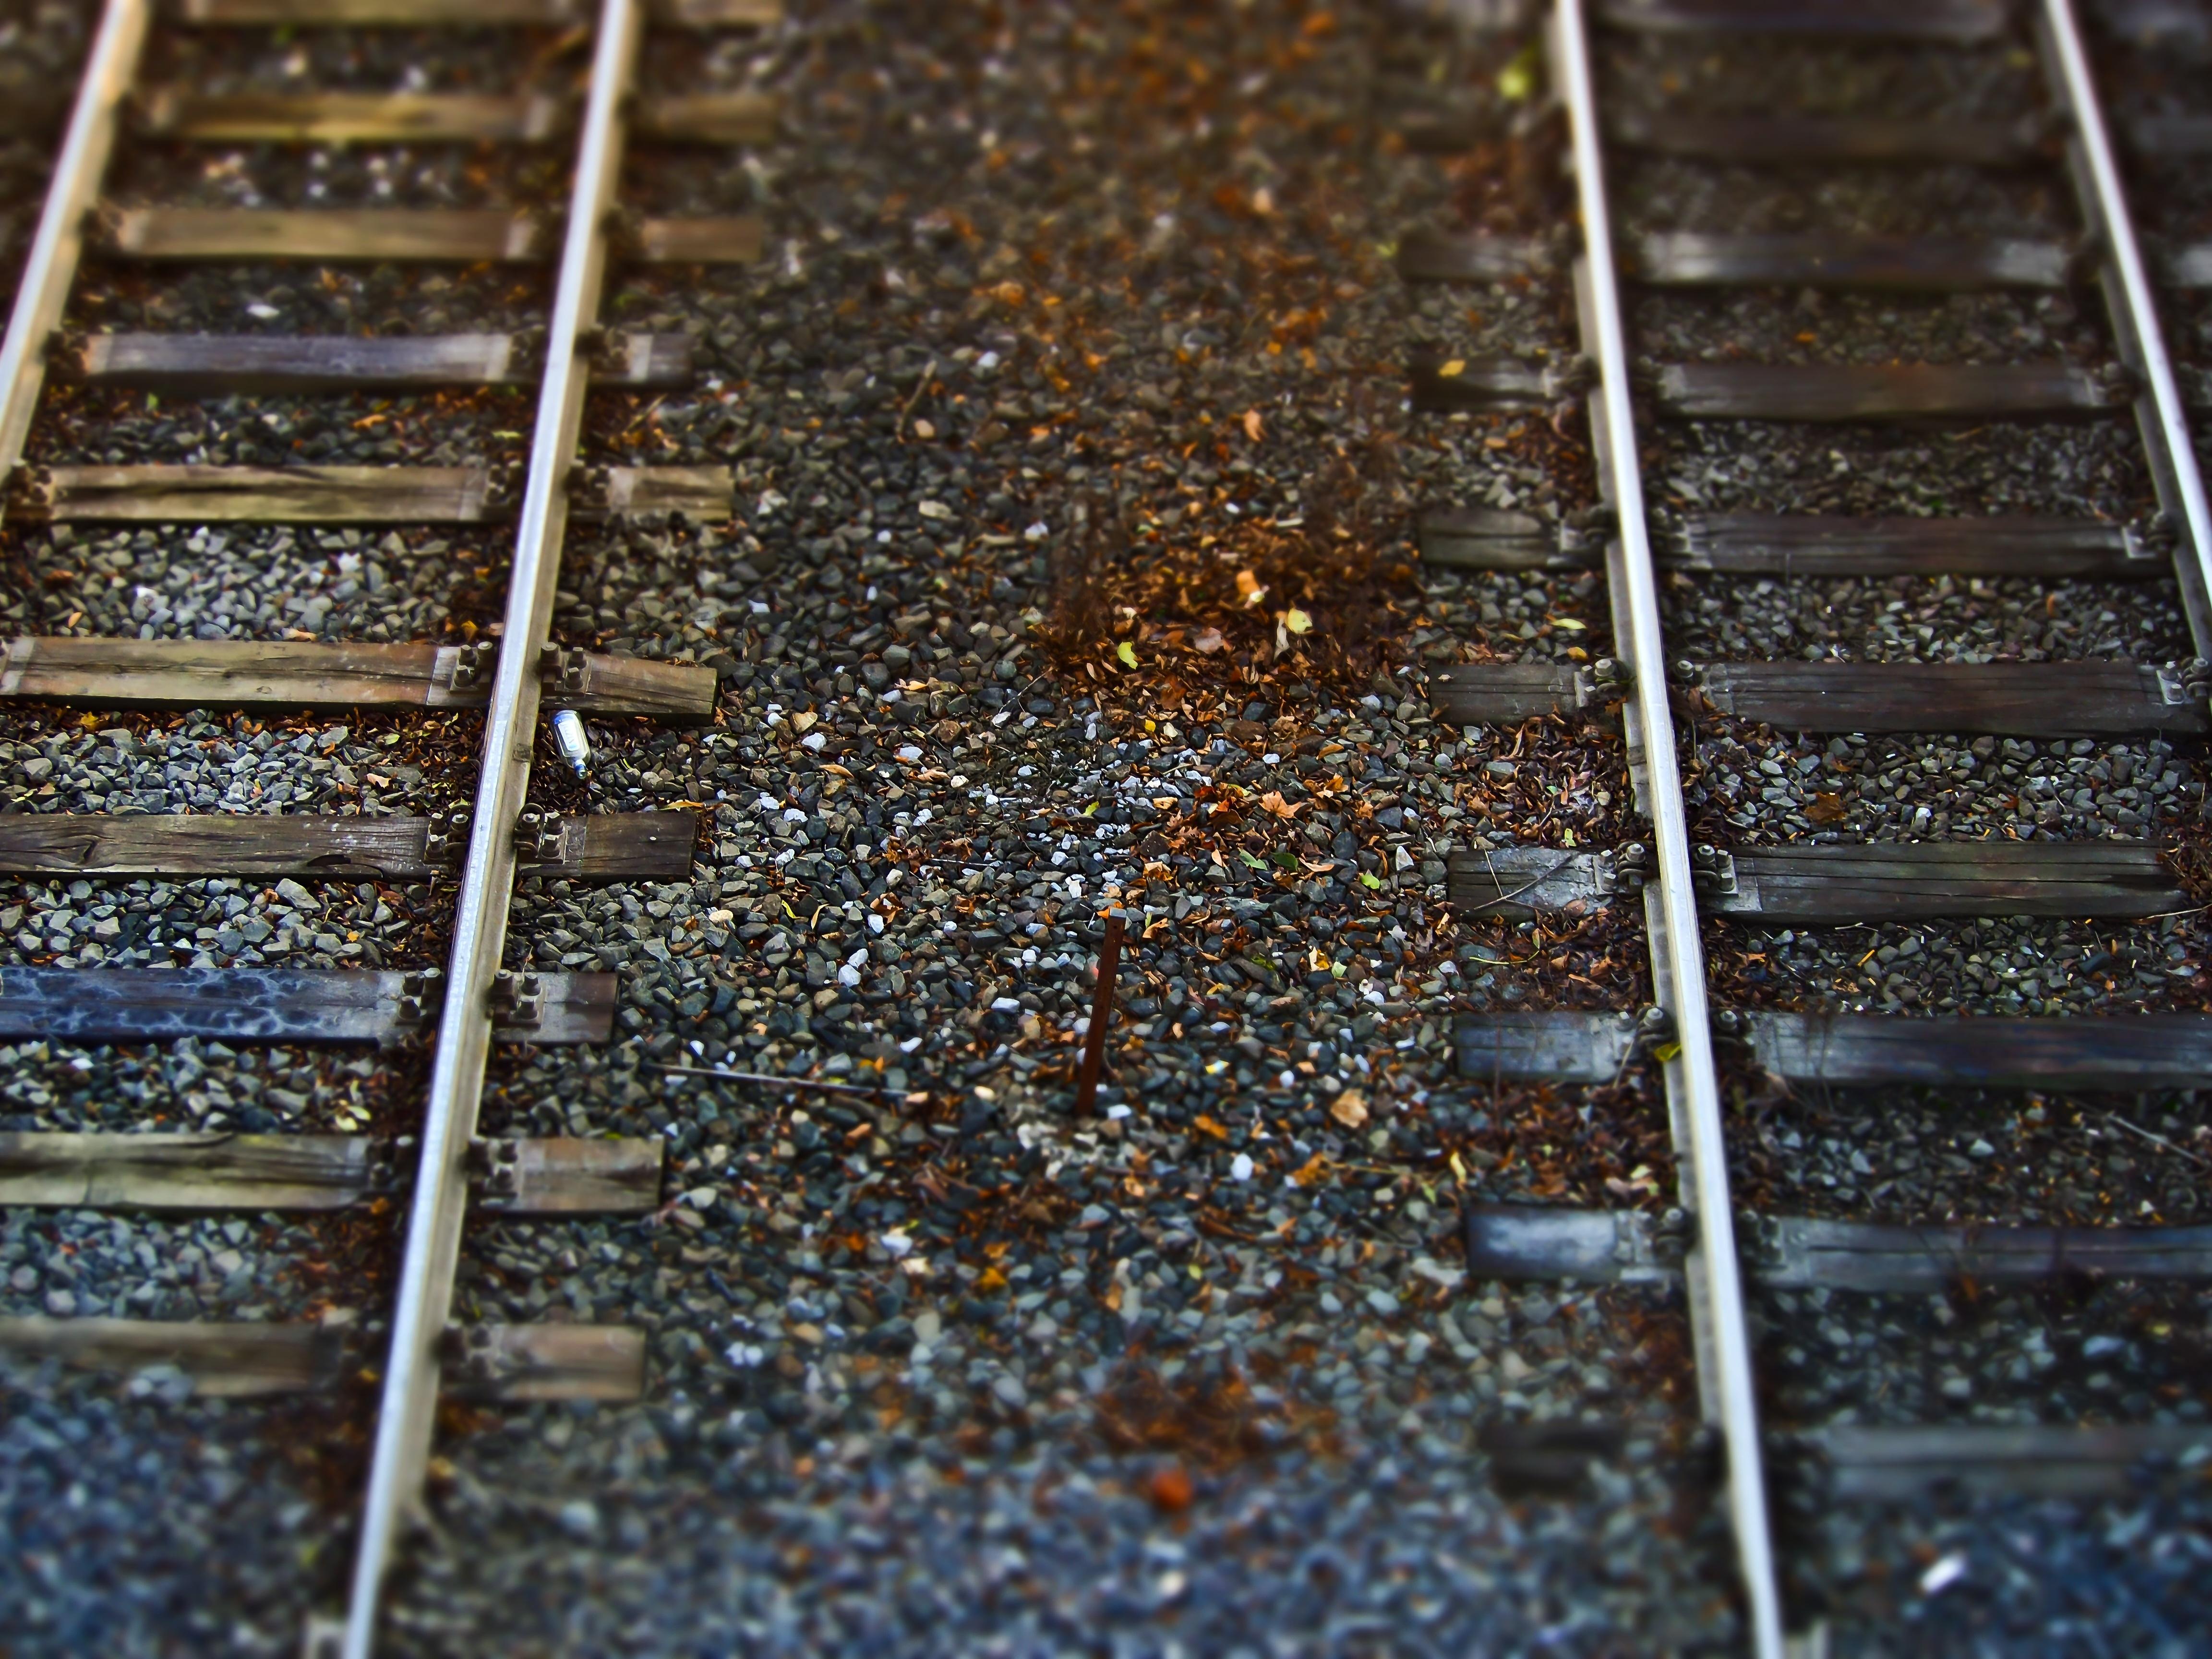 Free Images : wood, railway, leaf, soil, stones, gravel